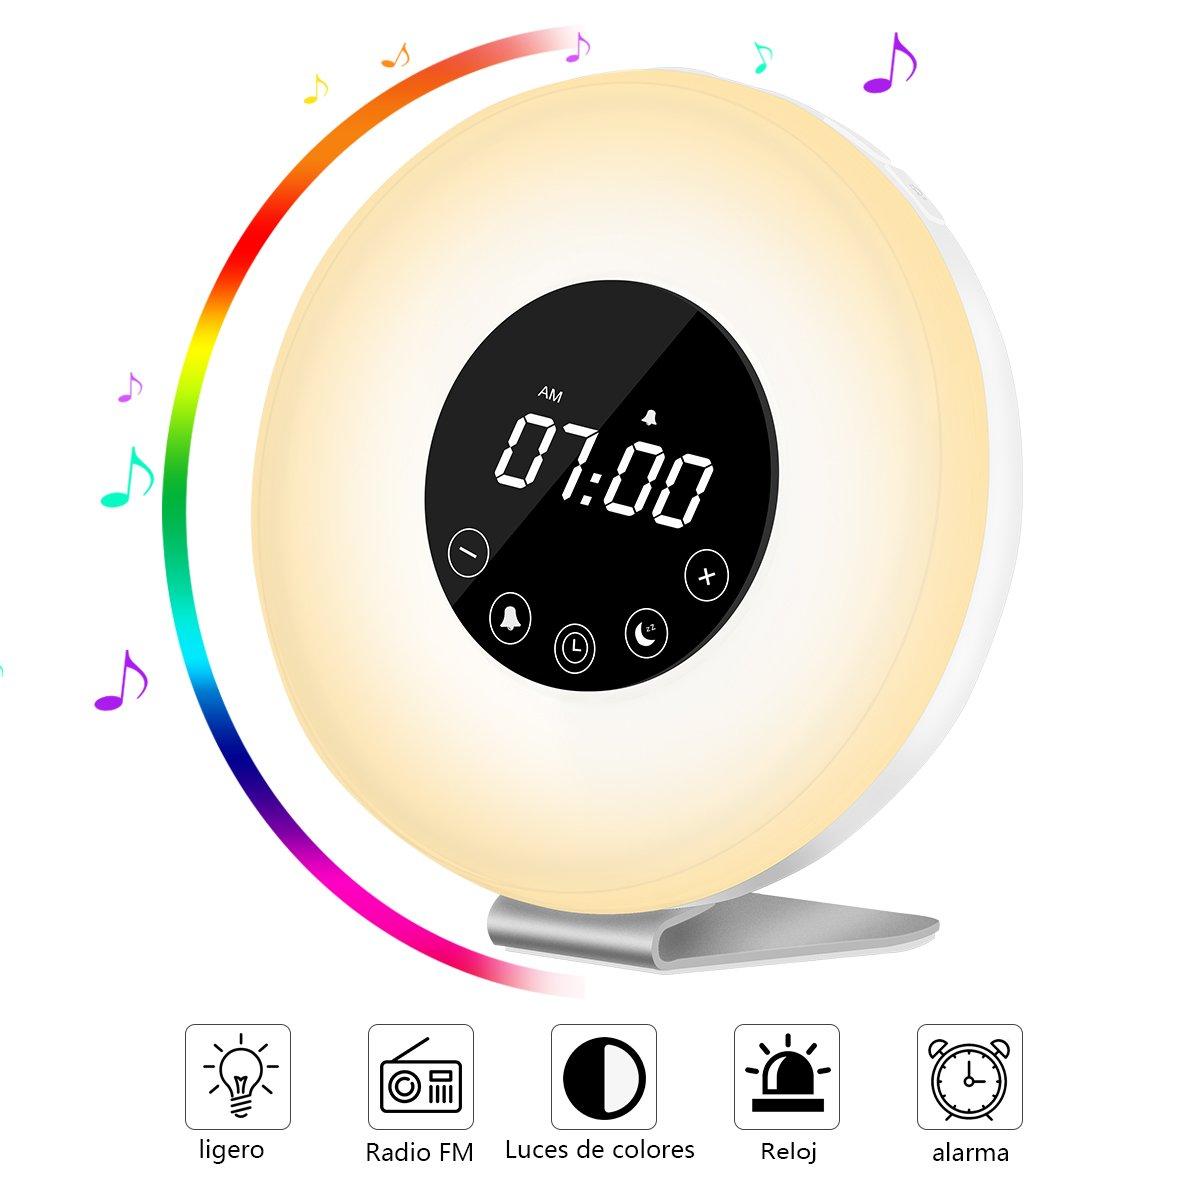 Wake Up Light Despertador con Luz – AUELEK LED Lámpara Luces-despertador, Simulación de Amanecer y Atardece, Función Snooze, 7 Luces LED de Colores, Radio FM, 6 Sonidos Naturales,10 Niveles de Brillo